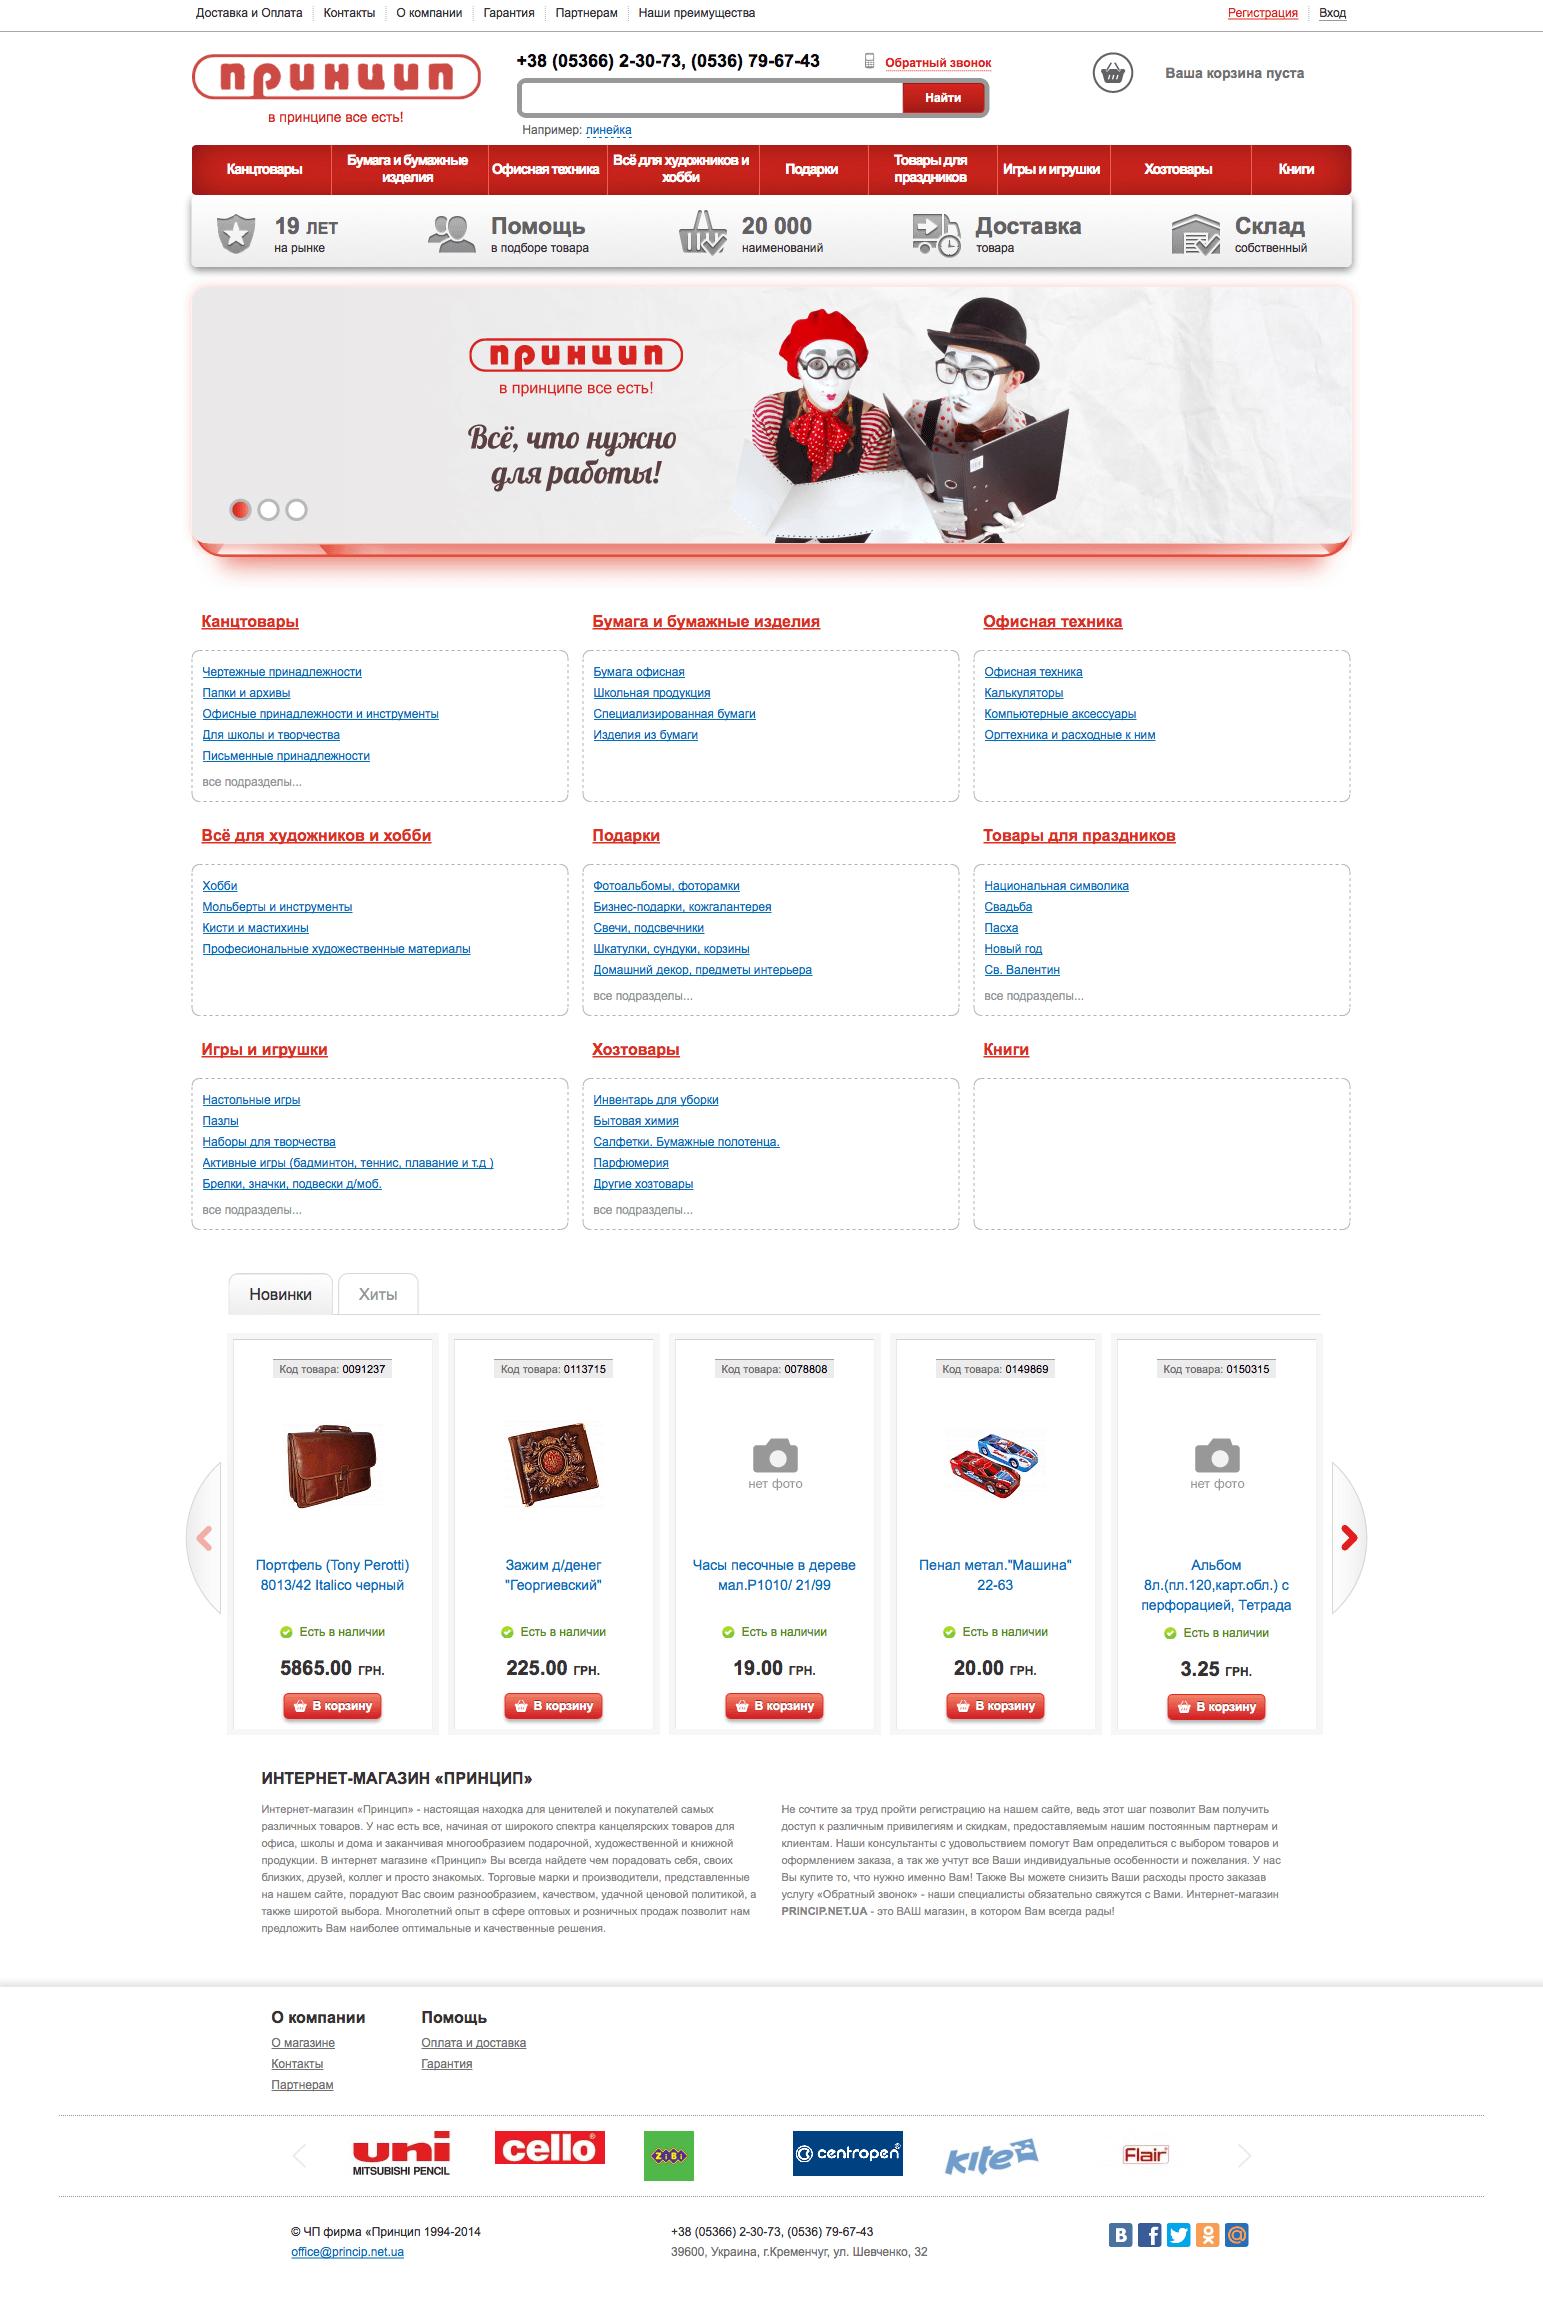 933b06f420f1 Принцип - интернет магазин канцелярских товаров - компания